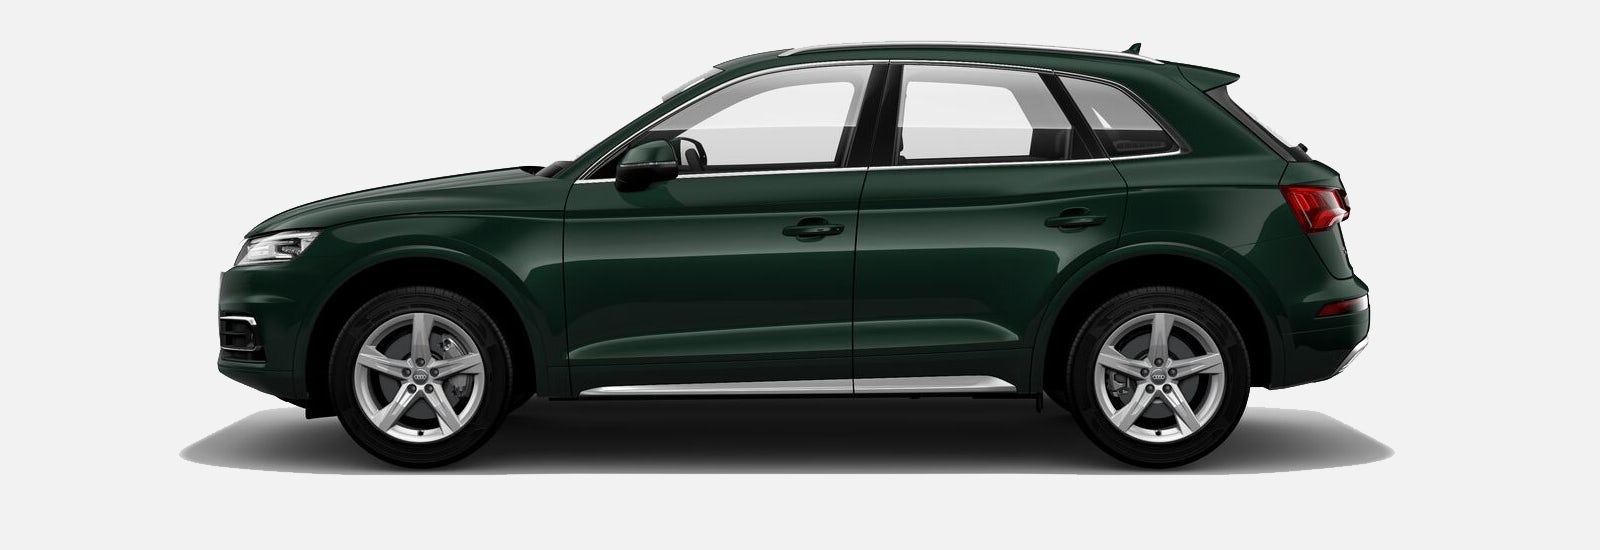 Audi Q5 2.0 TFSI SUV/Crossover 2017